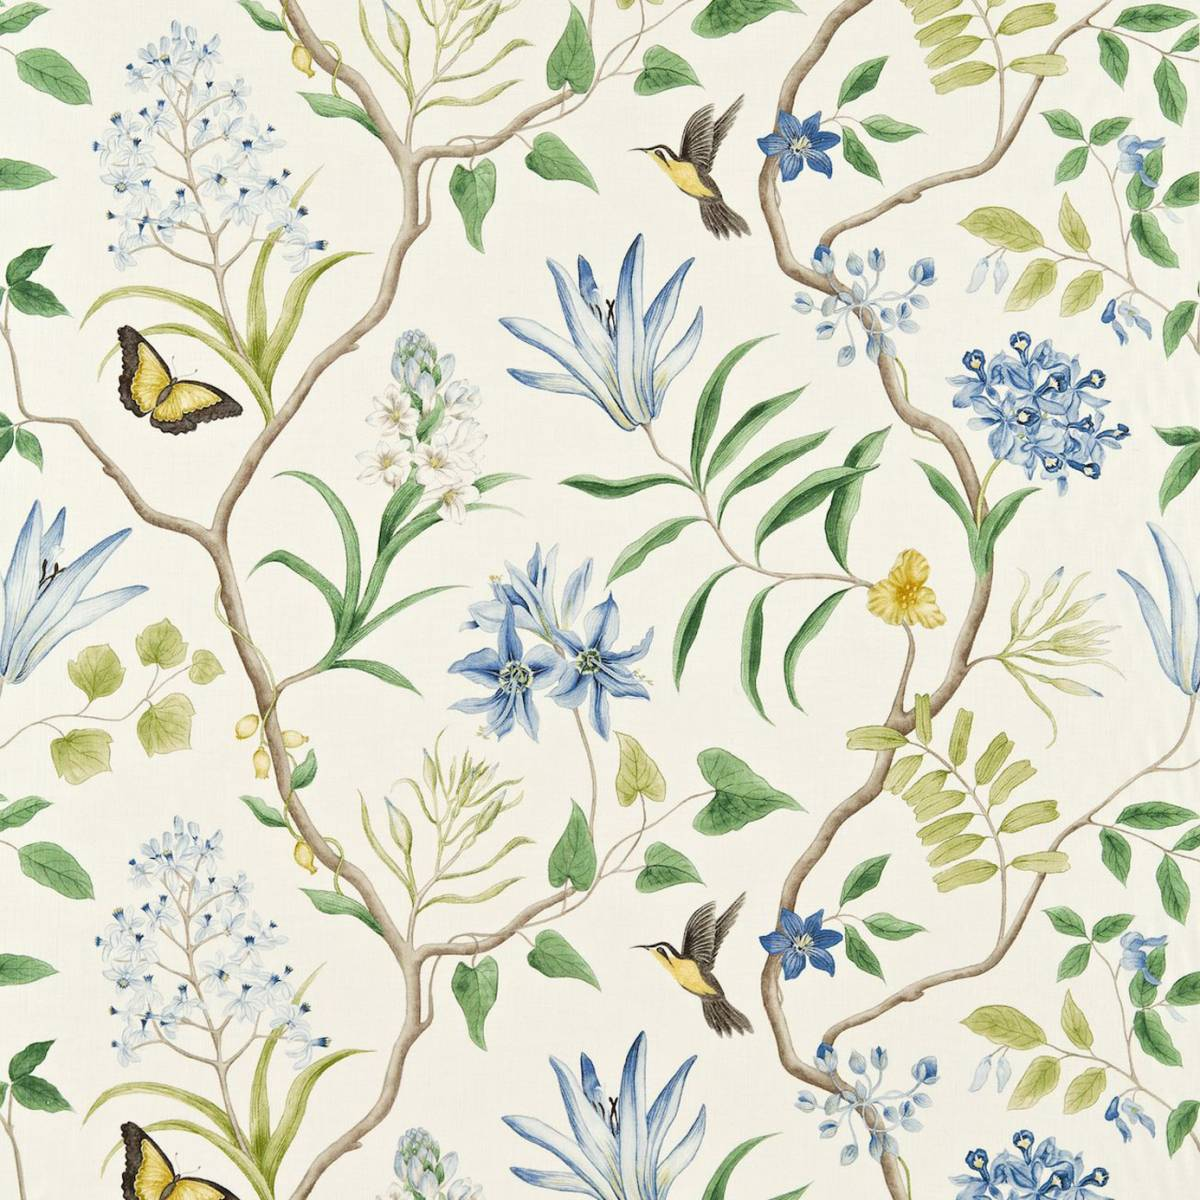 clementine fabric delft blue 223299 sanderson voyage. Black Bedroom Furniture Sets. Home Design Ideas